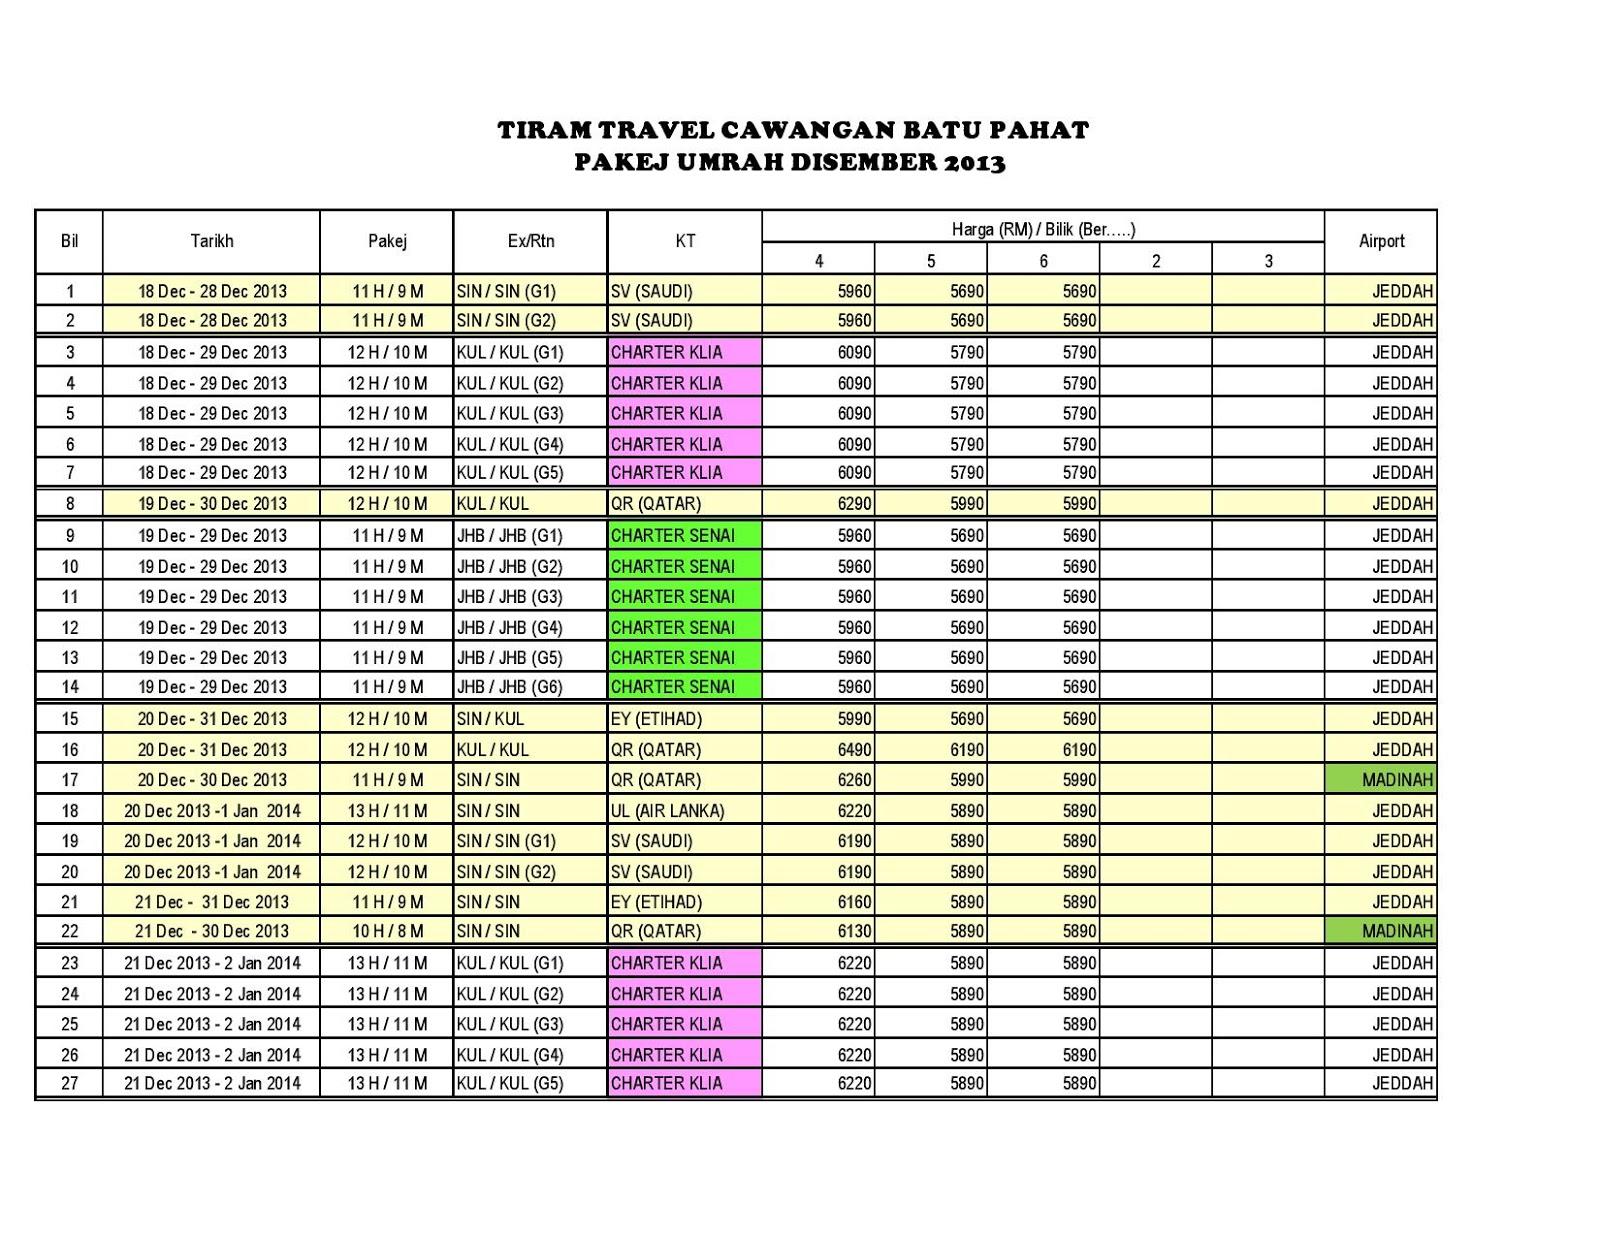 Pakej Umrah Tiram Travel untuk Bulan Disember 2013 dan Awal 2014